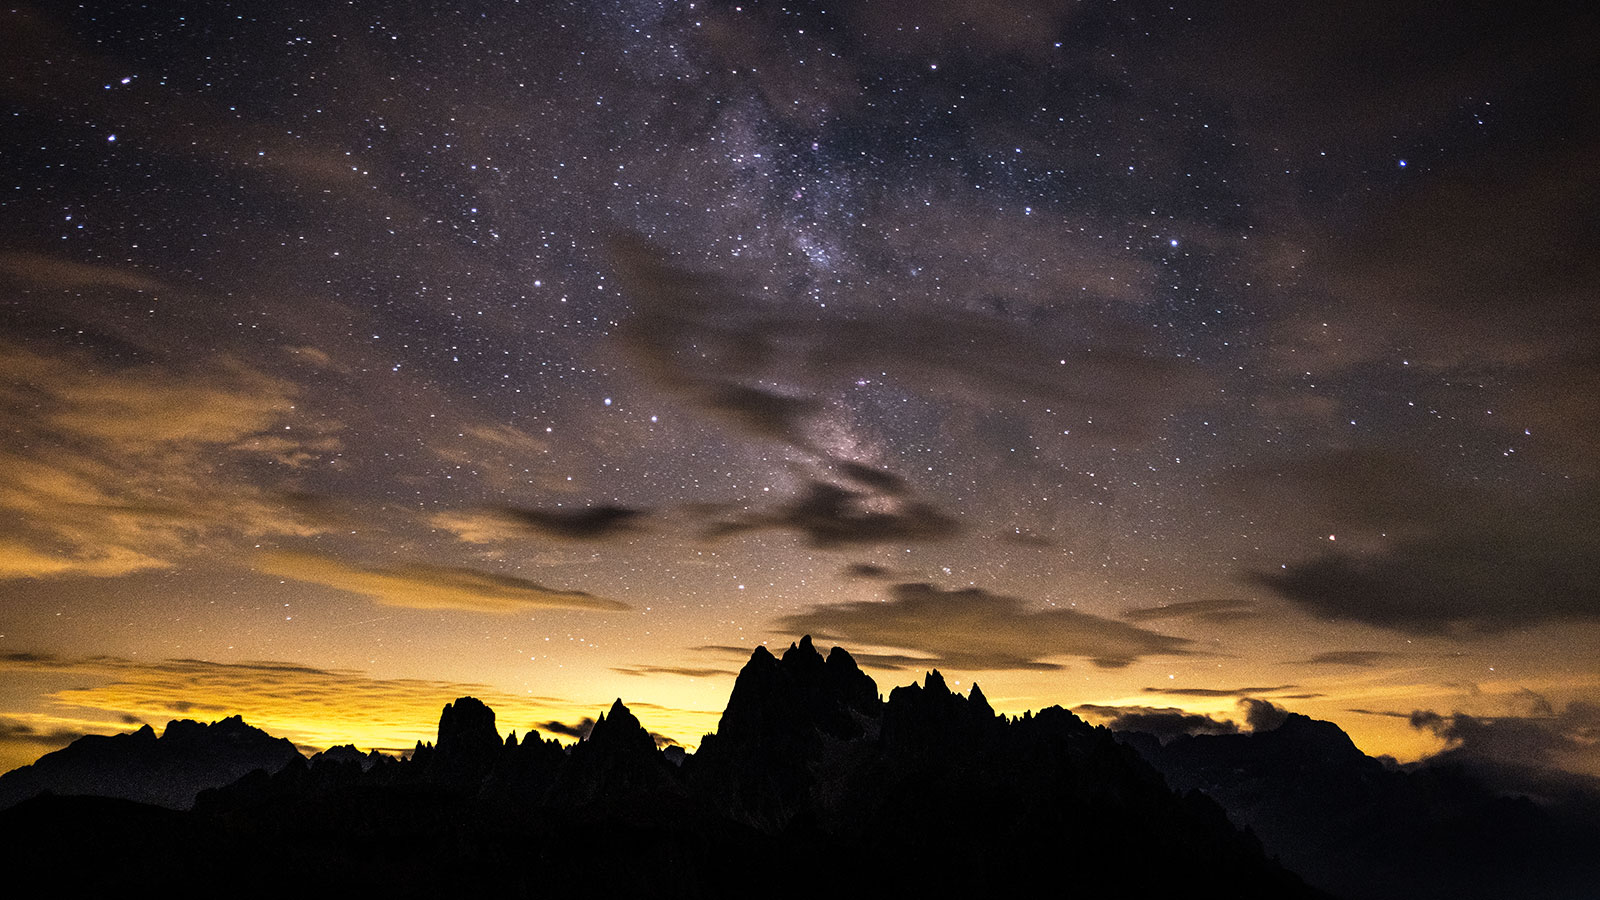 Sternennacht. Dolomiten Cadini | Pauli Trenkwalder, Berge & Psychologie